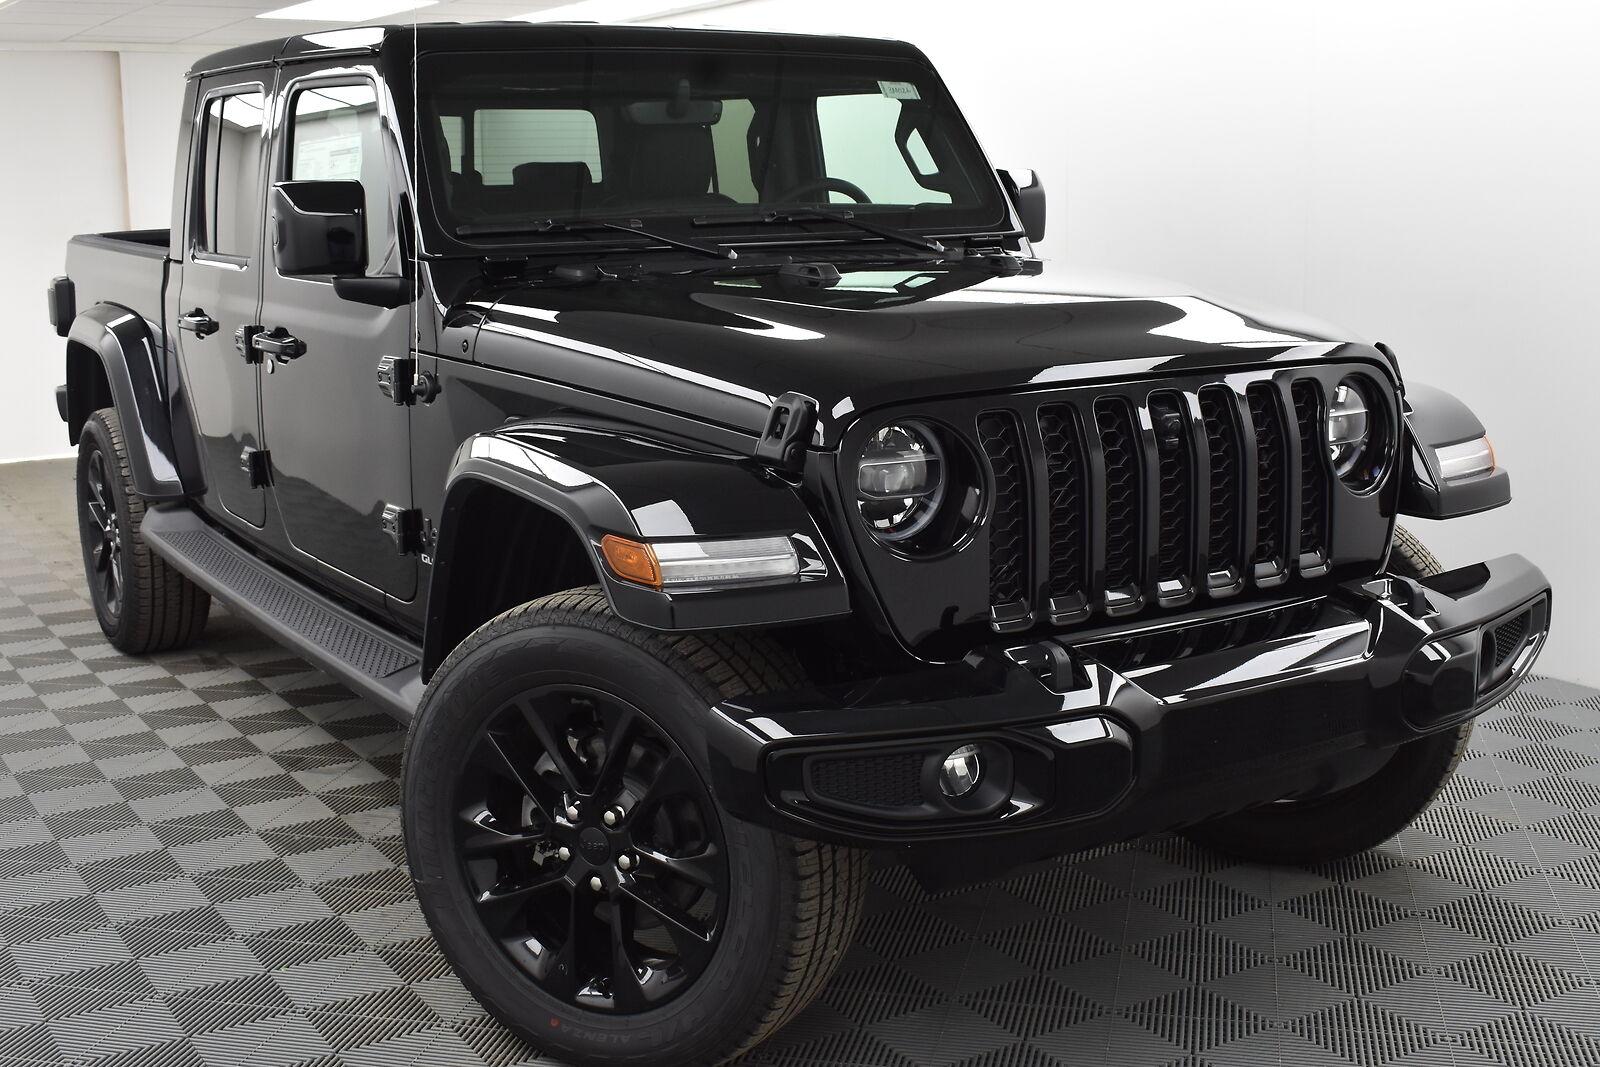 2021 jeep gladiator overland high altitude 4x4 diesel